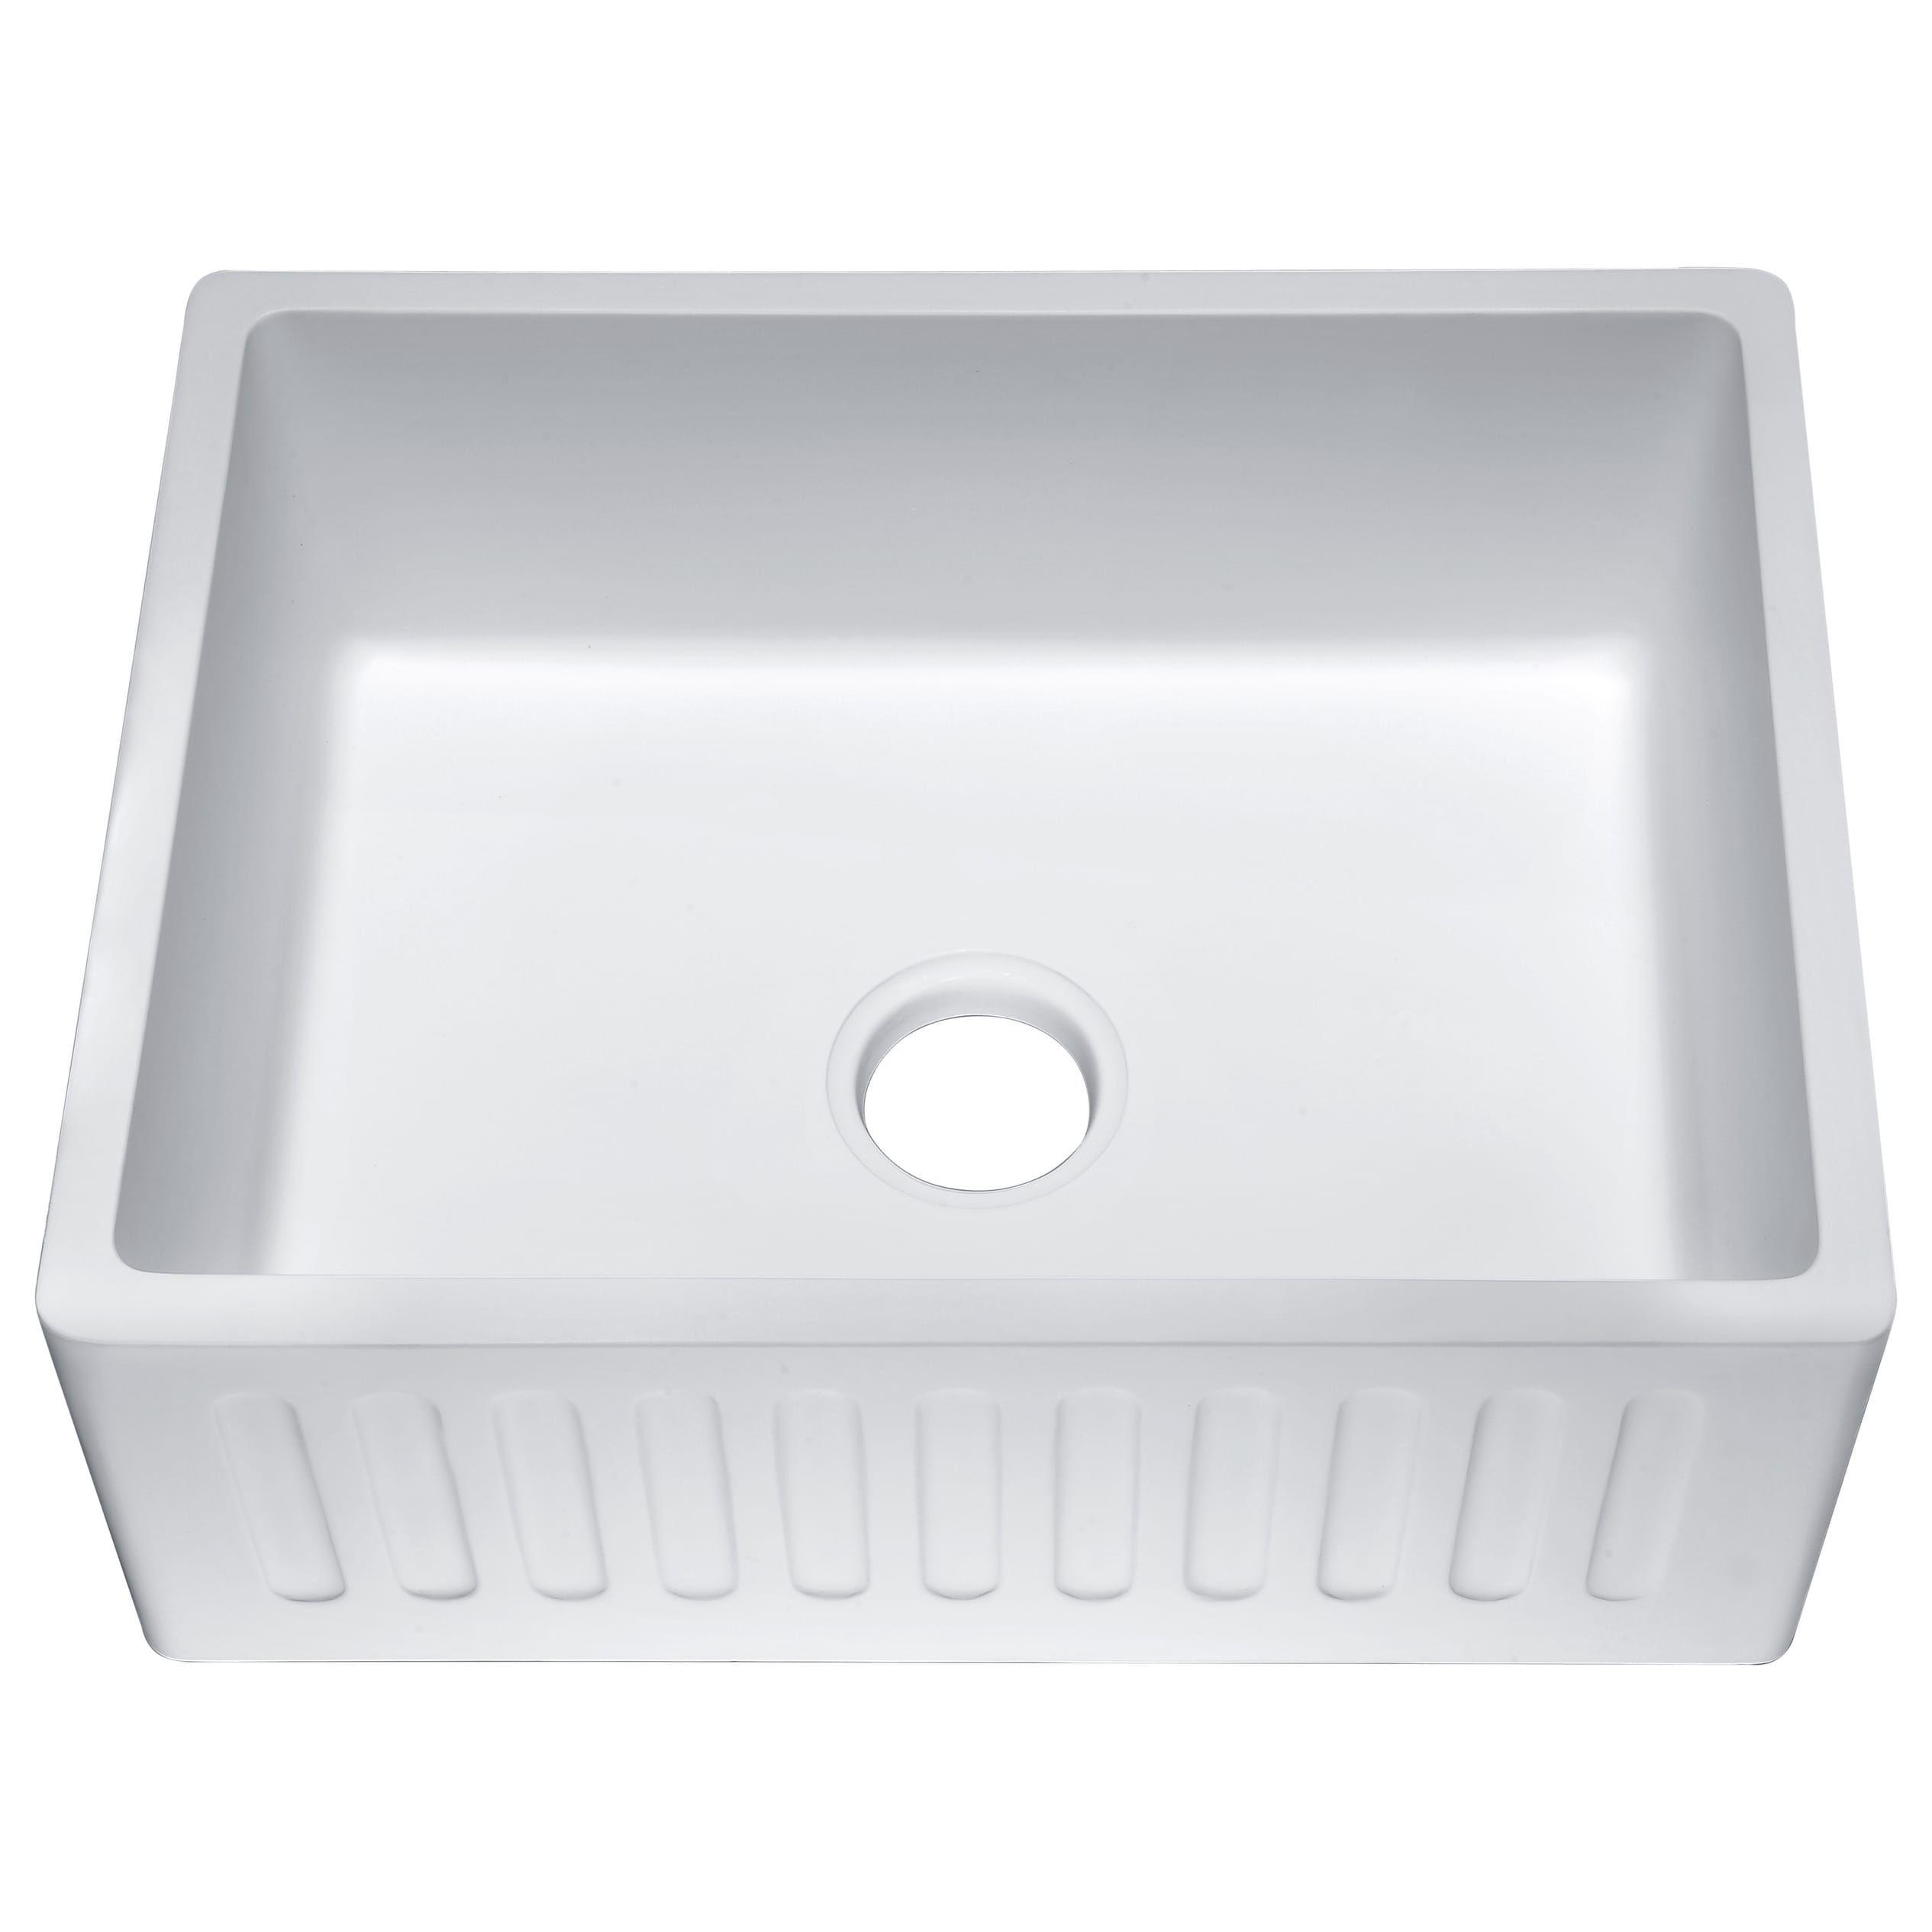 Anzzi Roine Farmhouse Apron Front Man Made Stone 24 In 0 Hole Single Bowl Kitchen Sink In Matte White Products Single Bowl Kitchen Sink Farmhouse Sink Ki